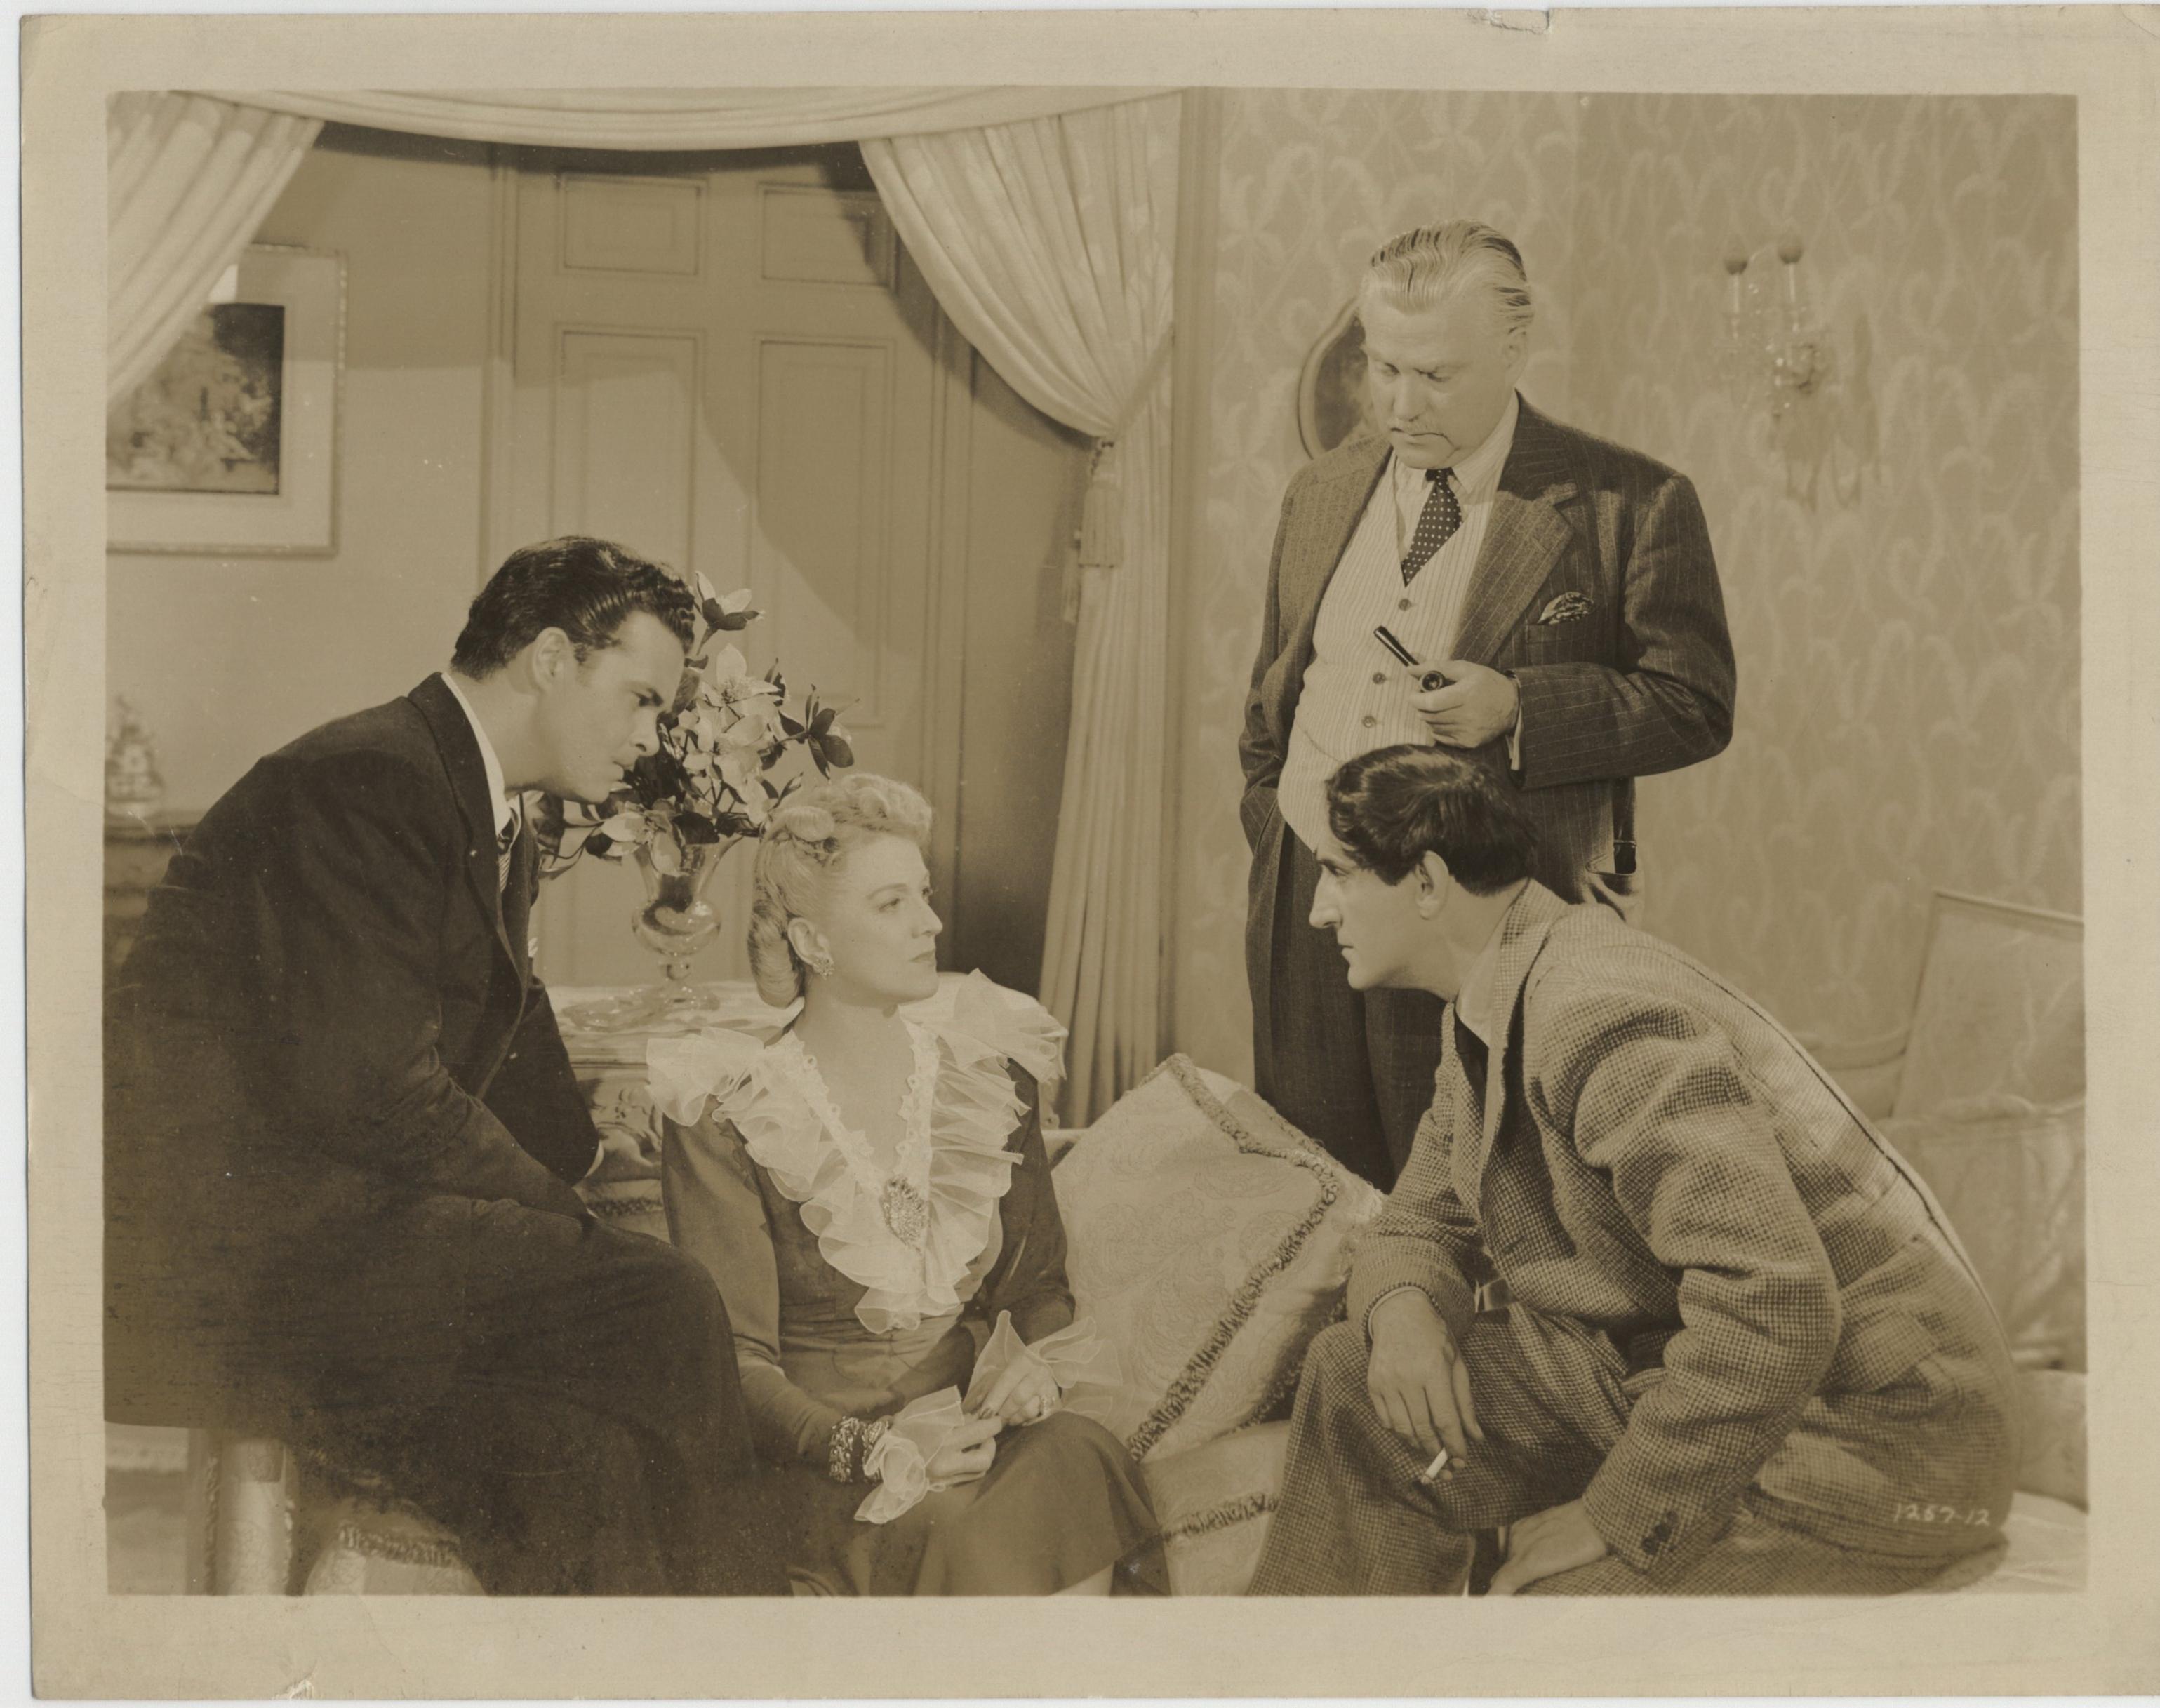 Basil Rathbone, Nigel Bruce, Edmund MacDonald, and Regina Wallace in Sherlock Holmes in Washington (1943)